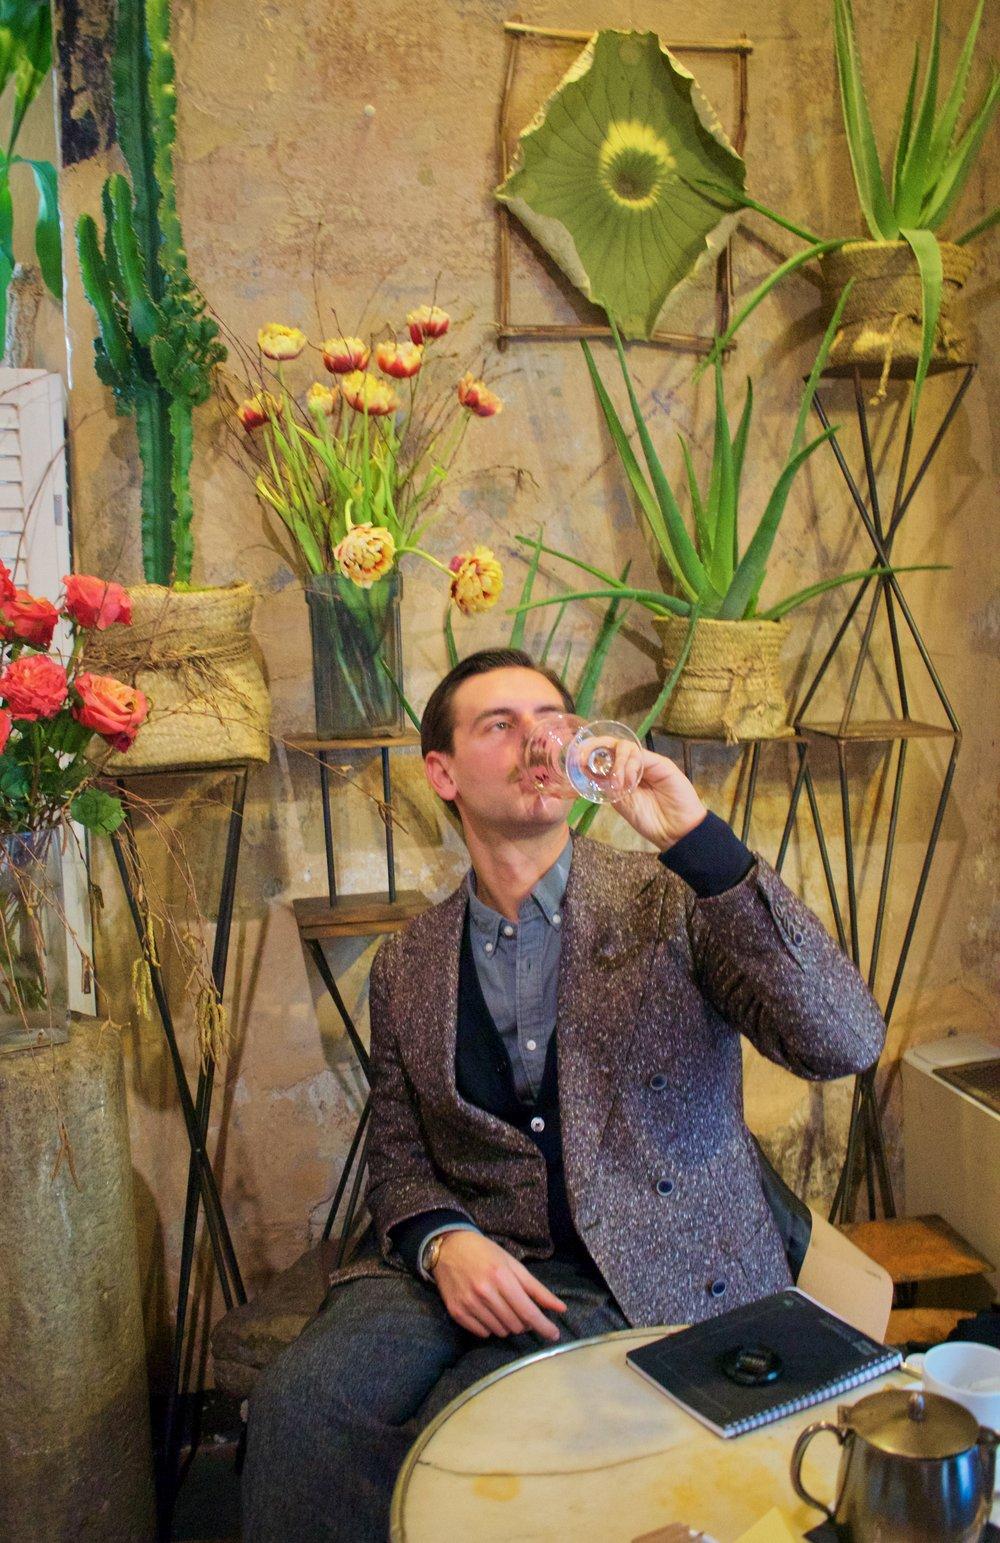 Eugenio Ormas - Creative agency cofounder